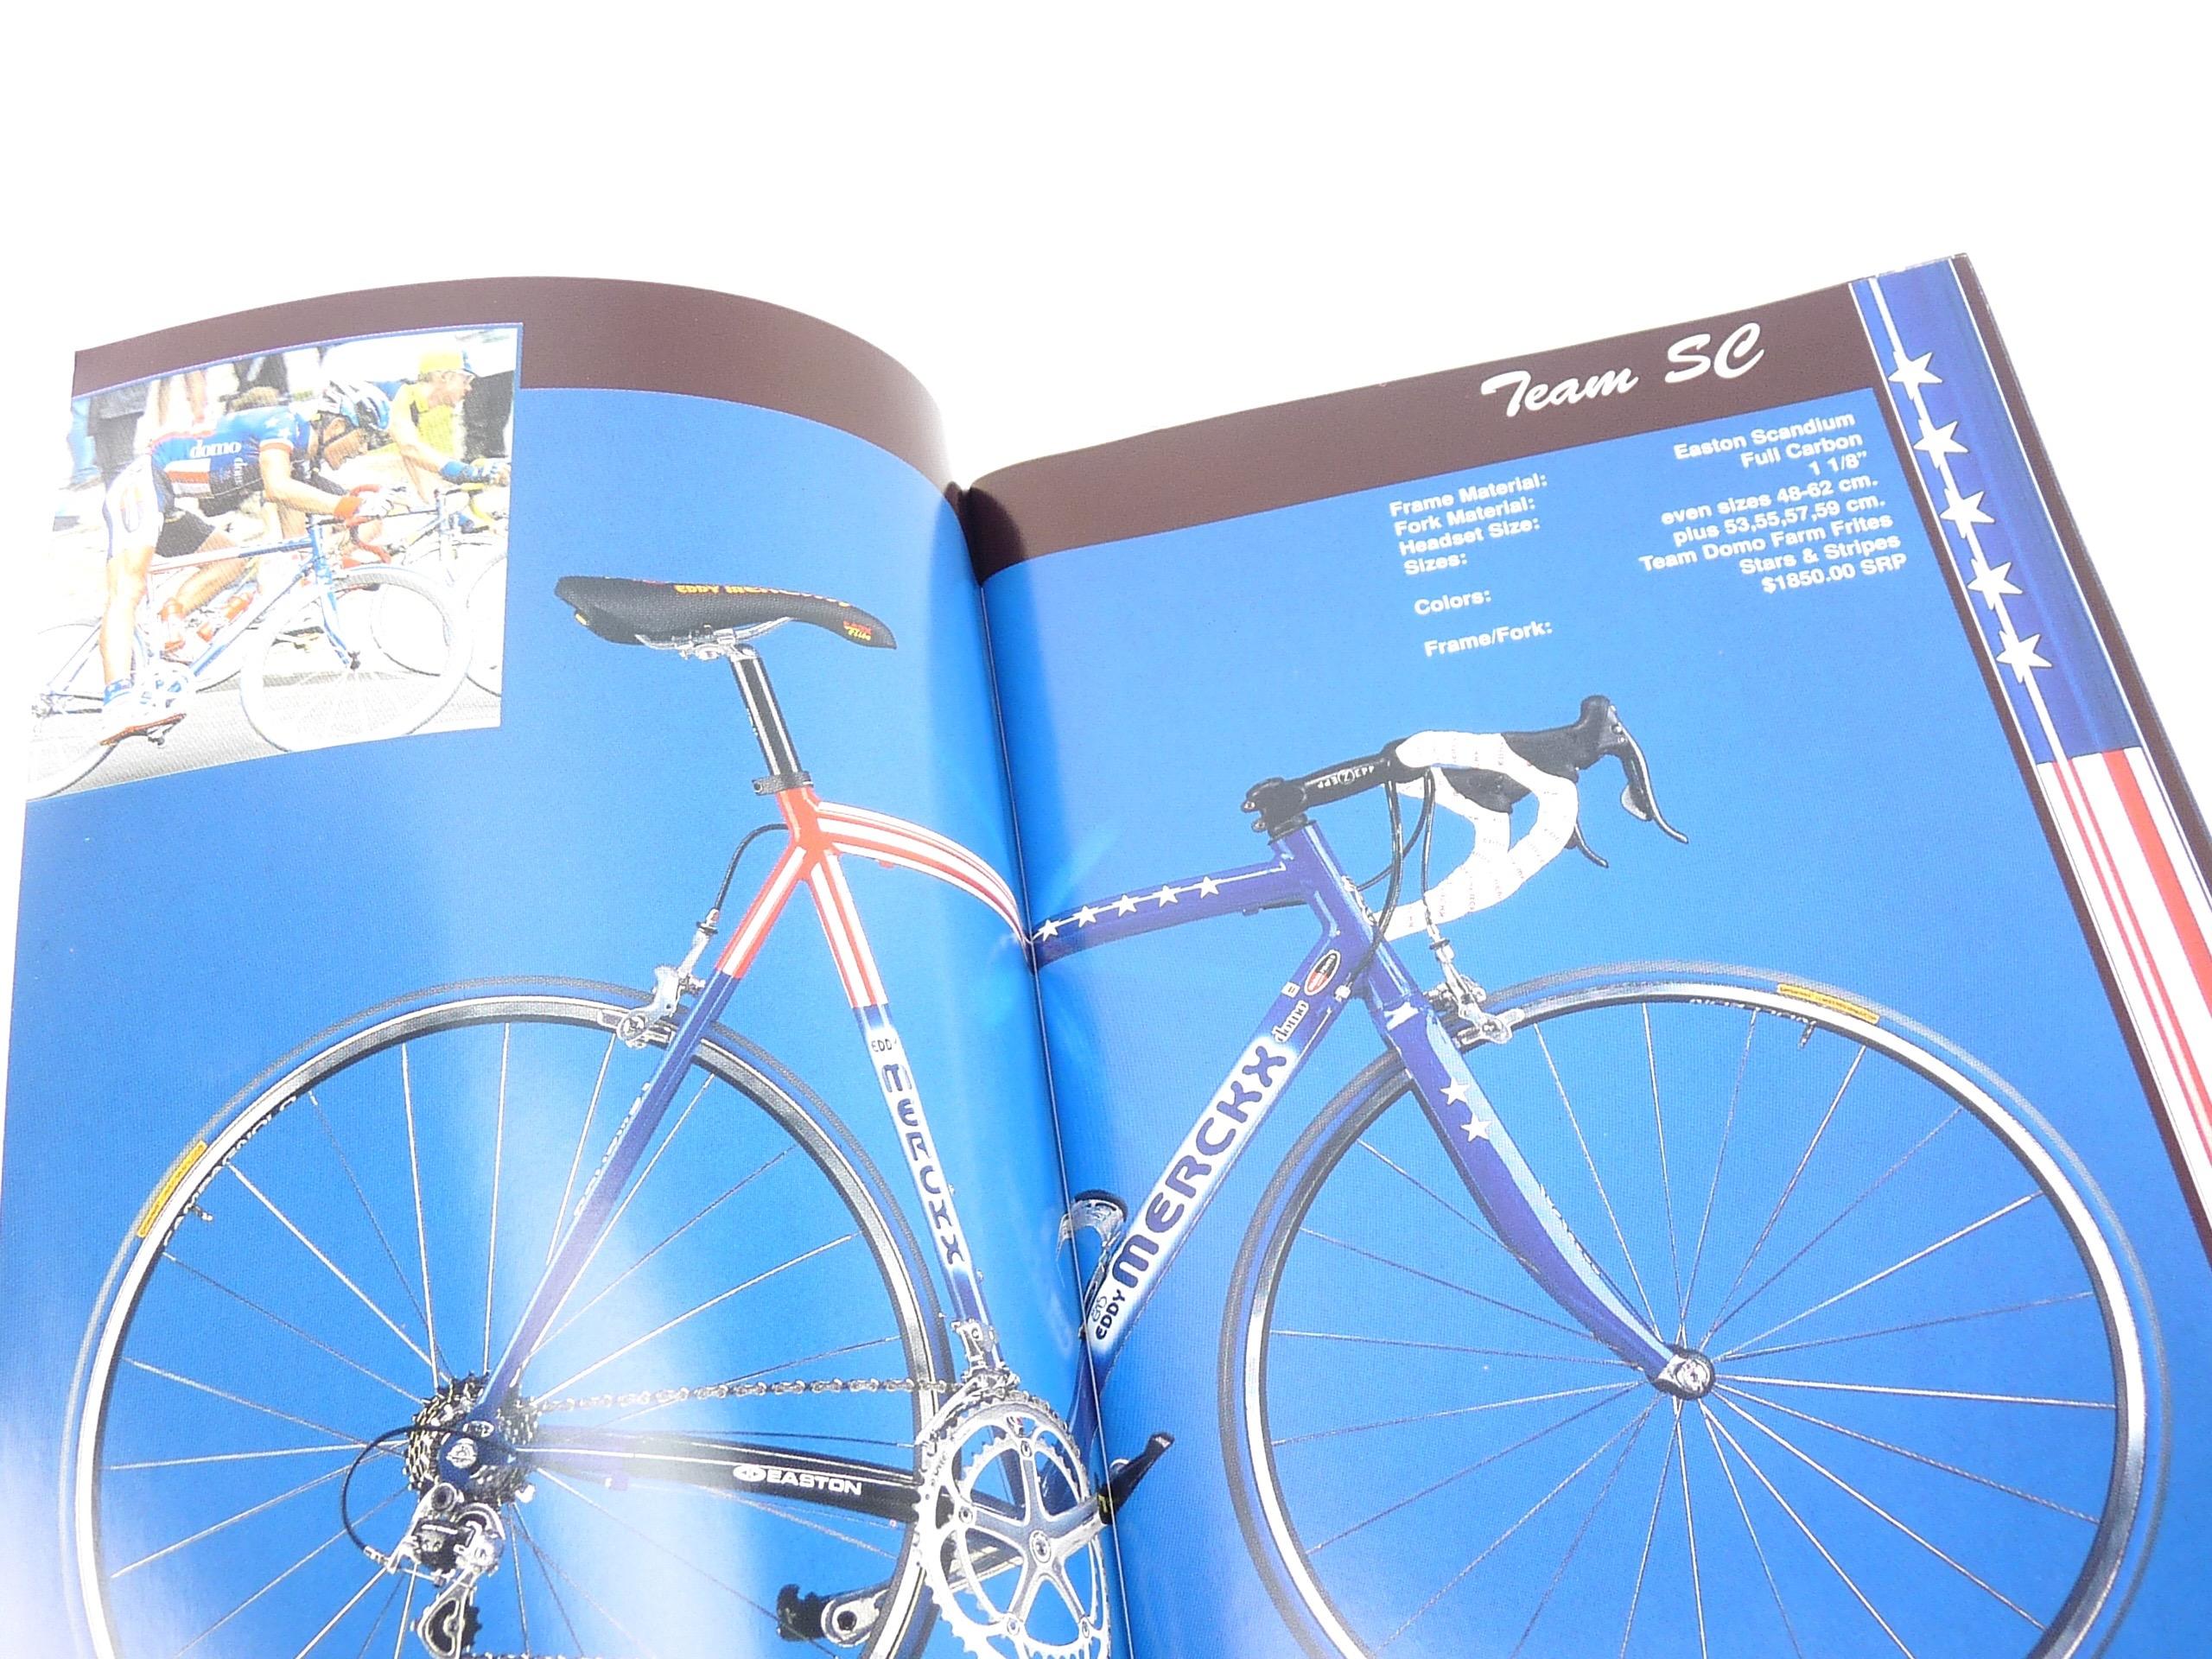 Details about  /Vintage NOS Bicycle Bike Fender Brace Measurements in Photos bc